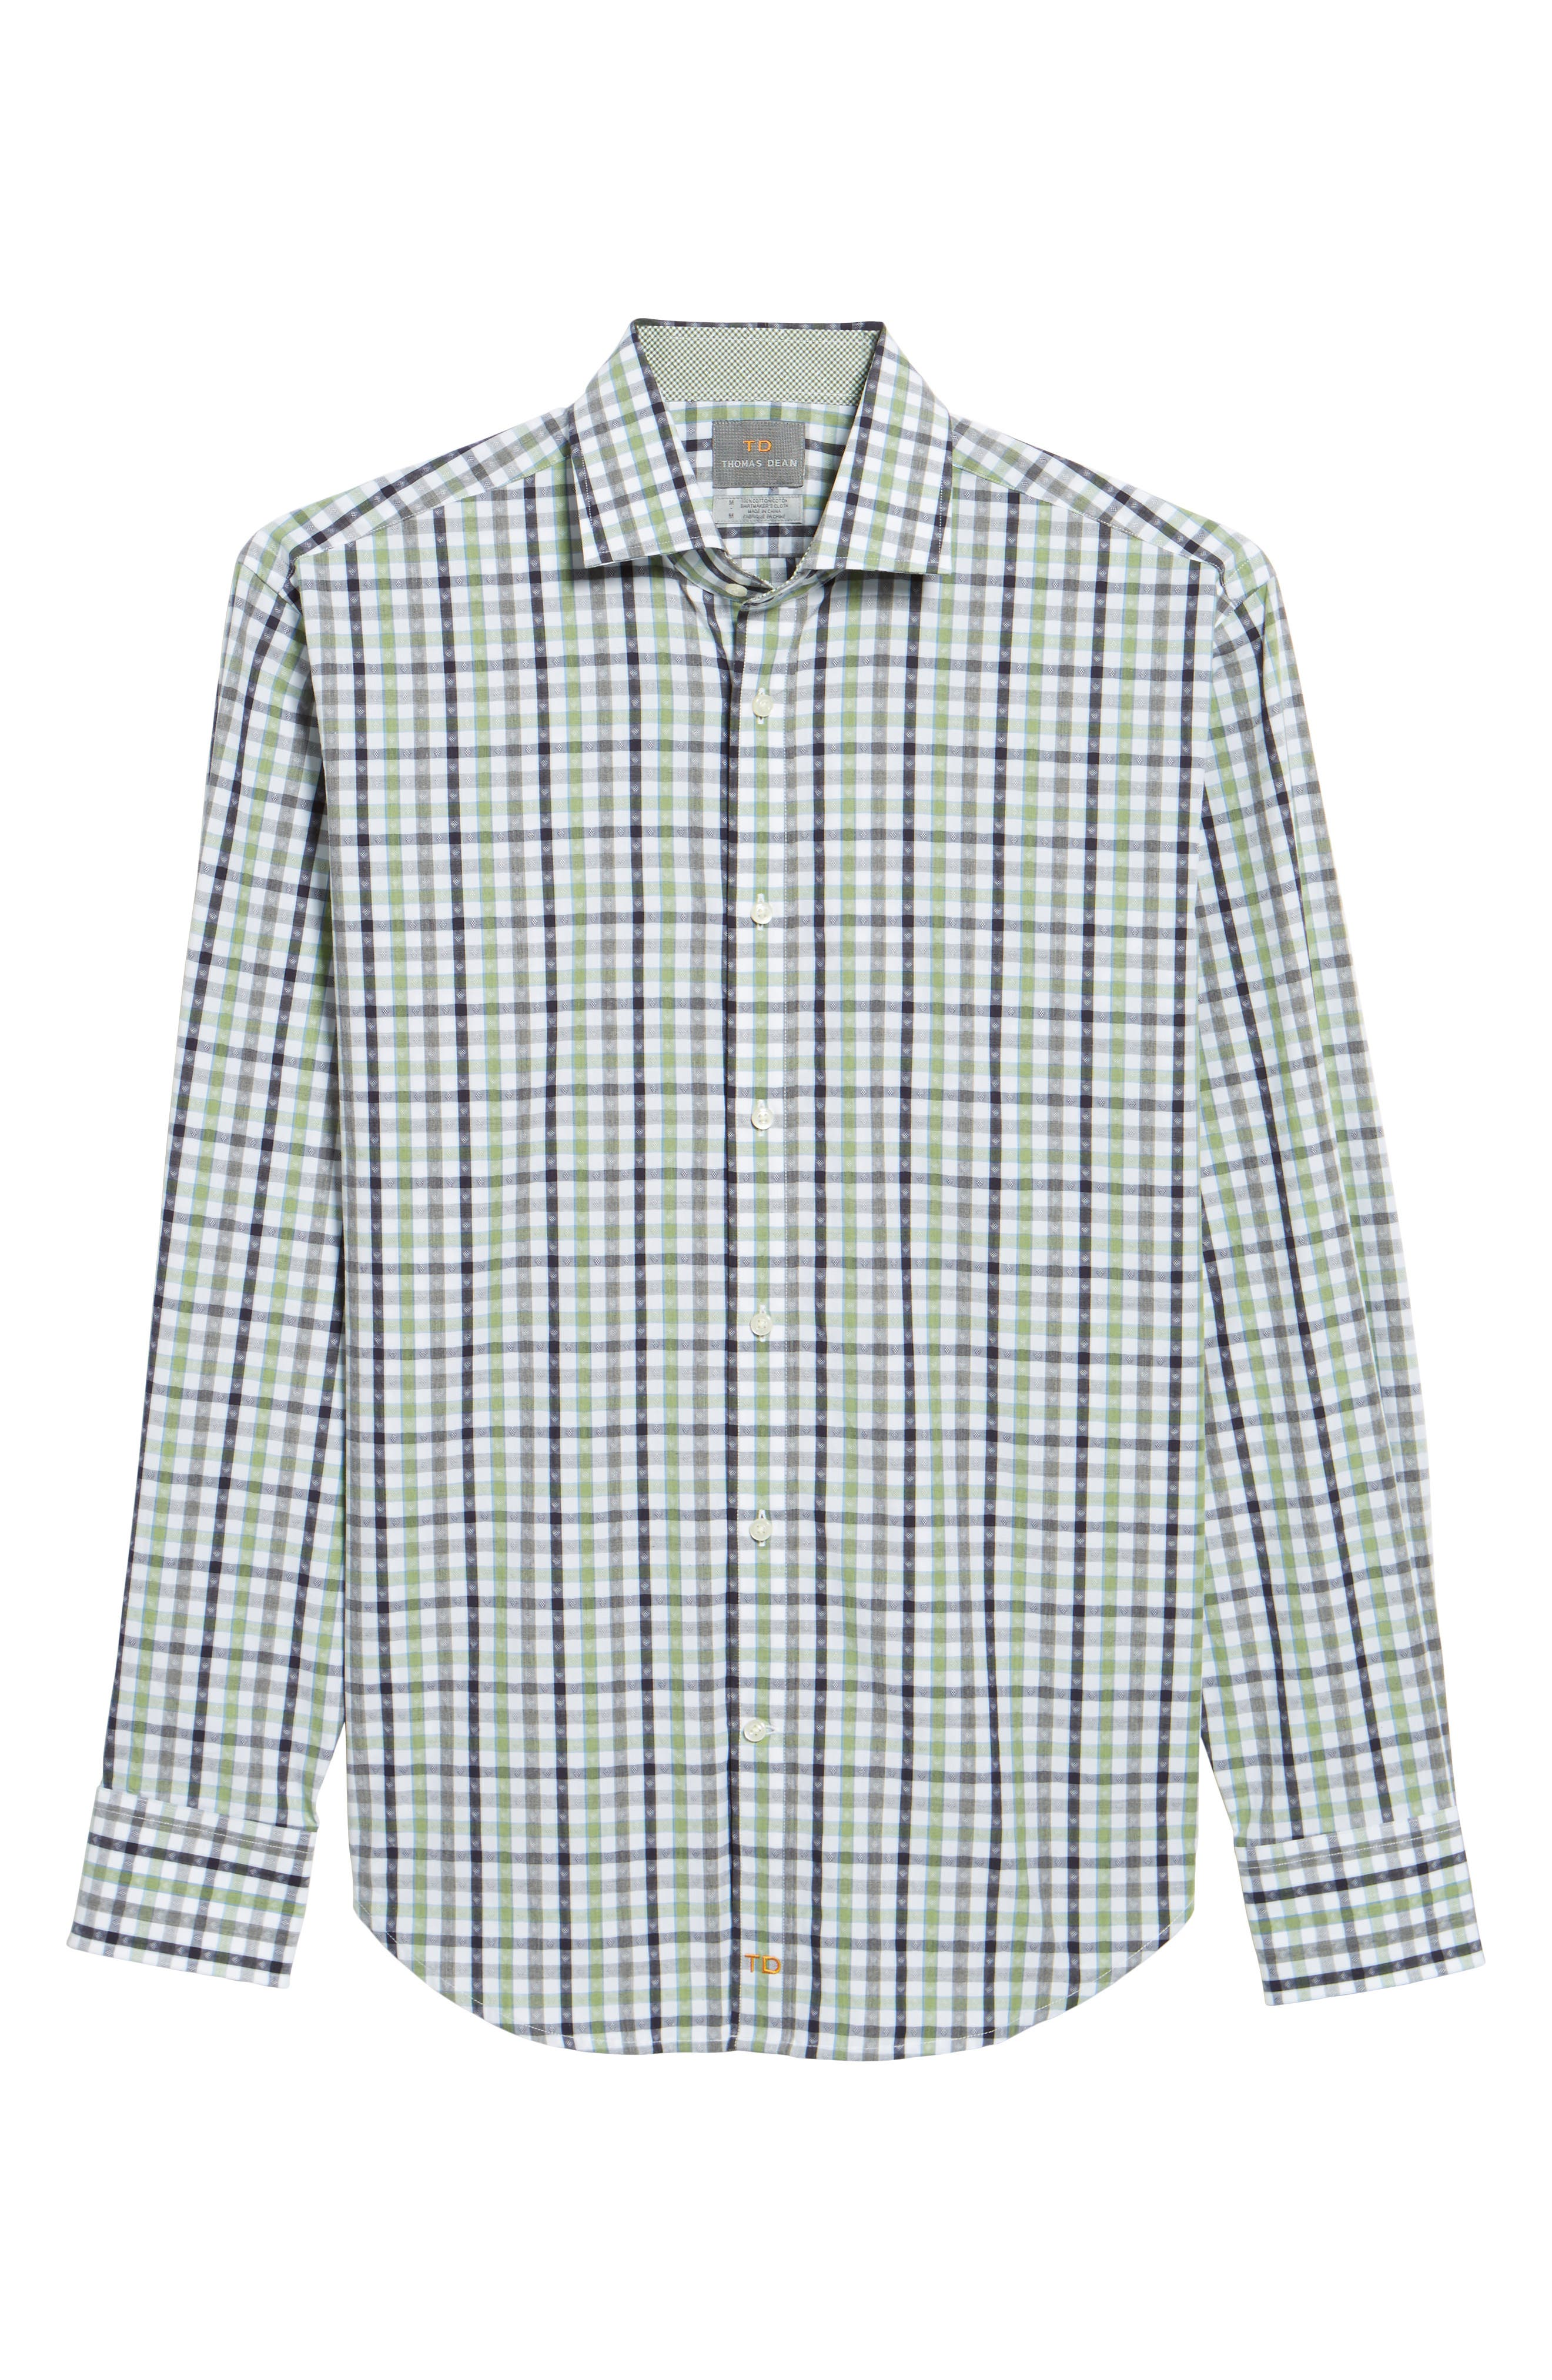 Plaid Sport Shirt,                             Alternate thumbnail 6, color,                             300